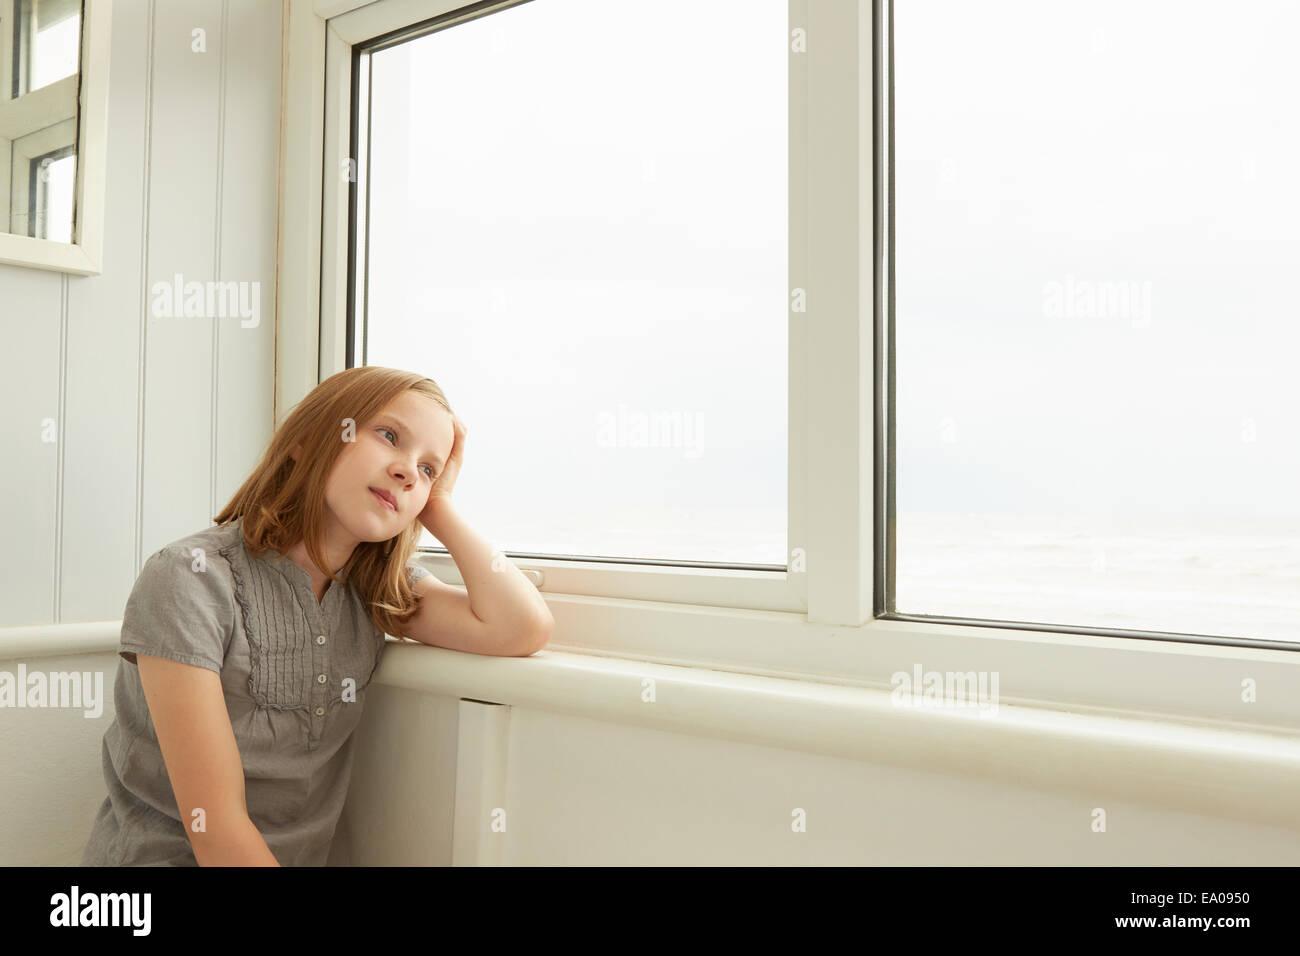 Retrato de niña mirando por la ventana apartamento Imagen De Stock